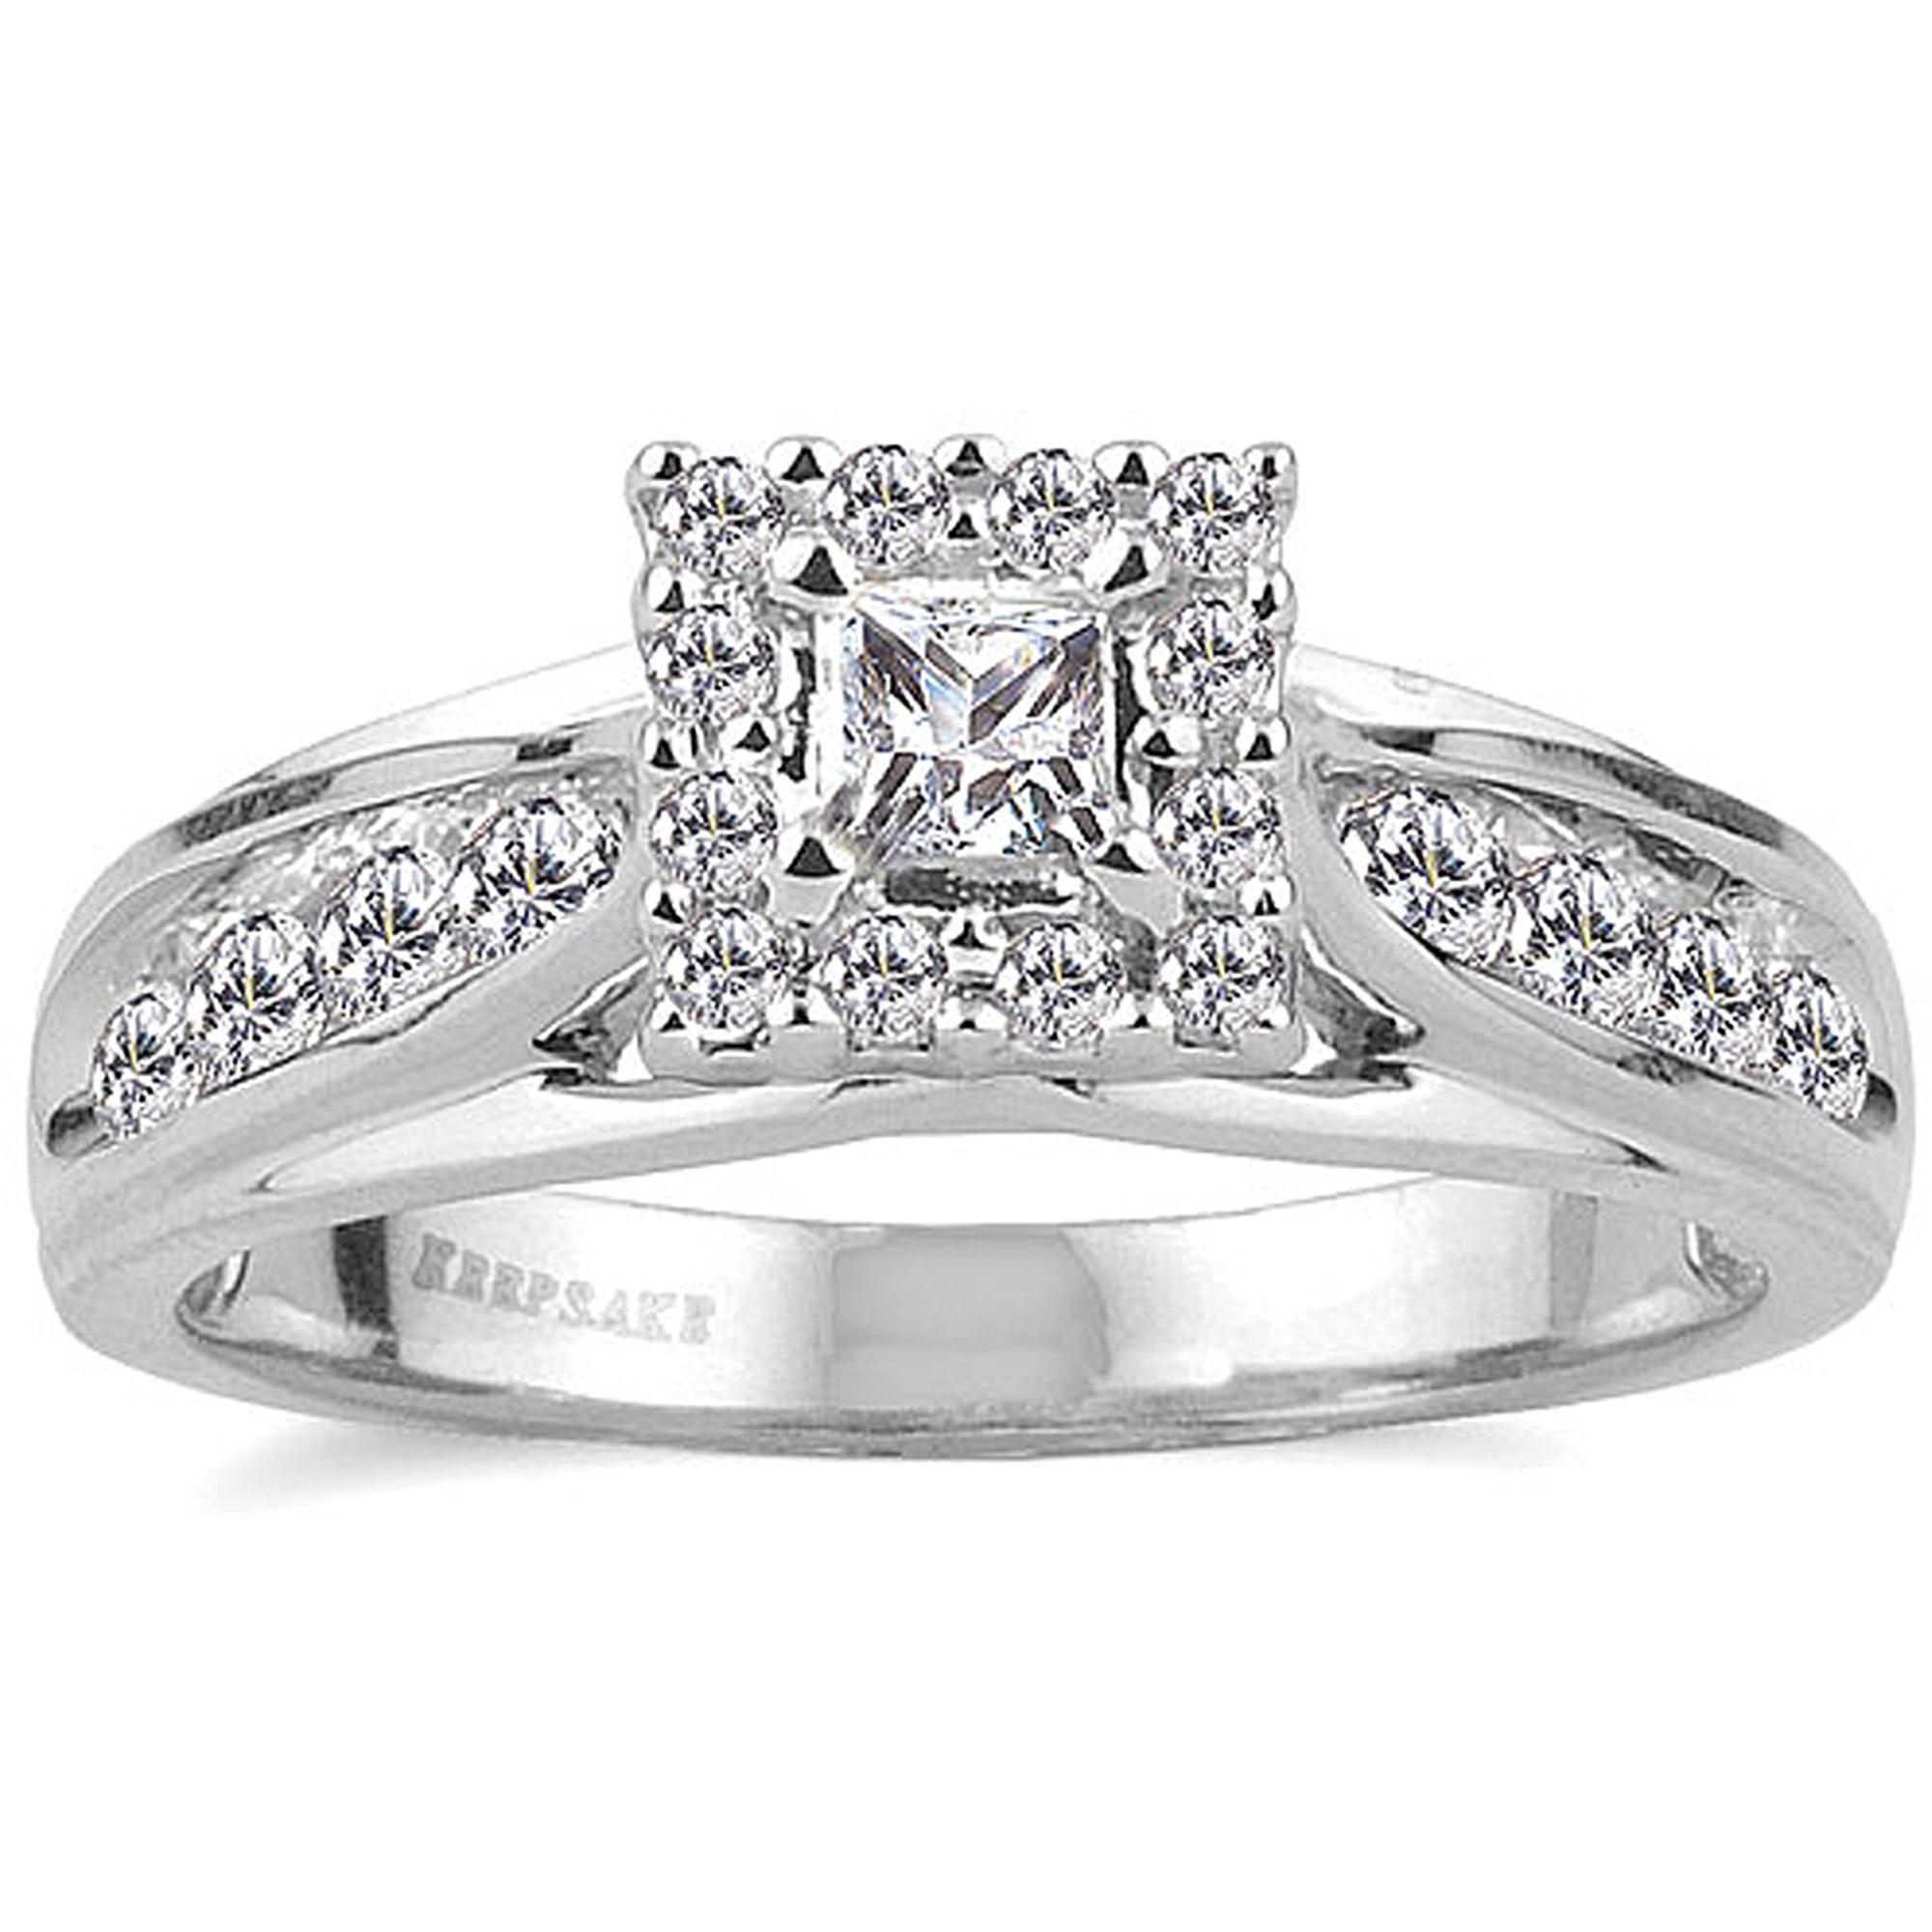 Keepsake Melody 1/2 Carat T.W. Diamond 10kt White Gold Engagement Ring